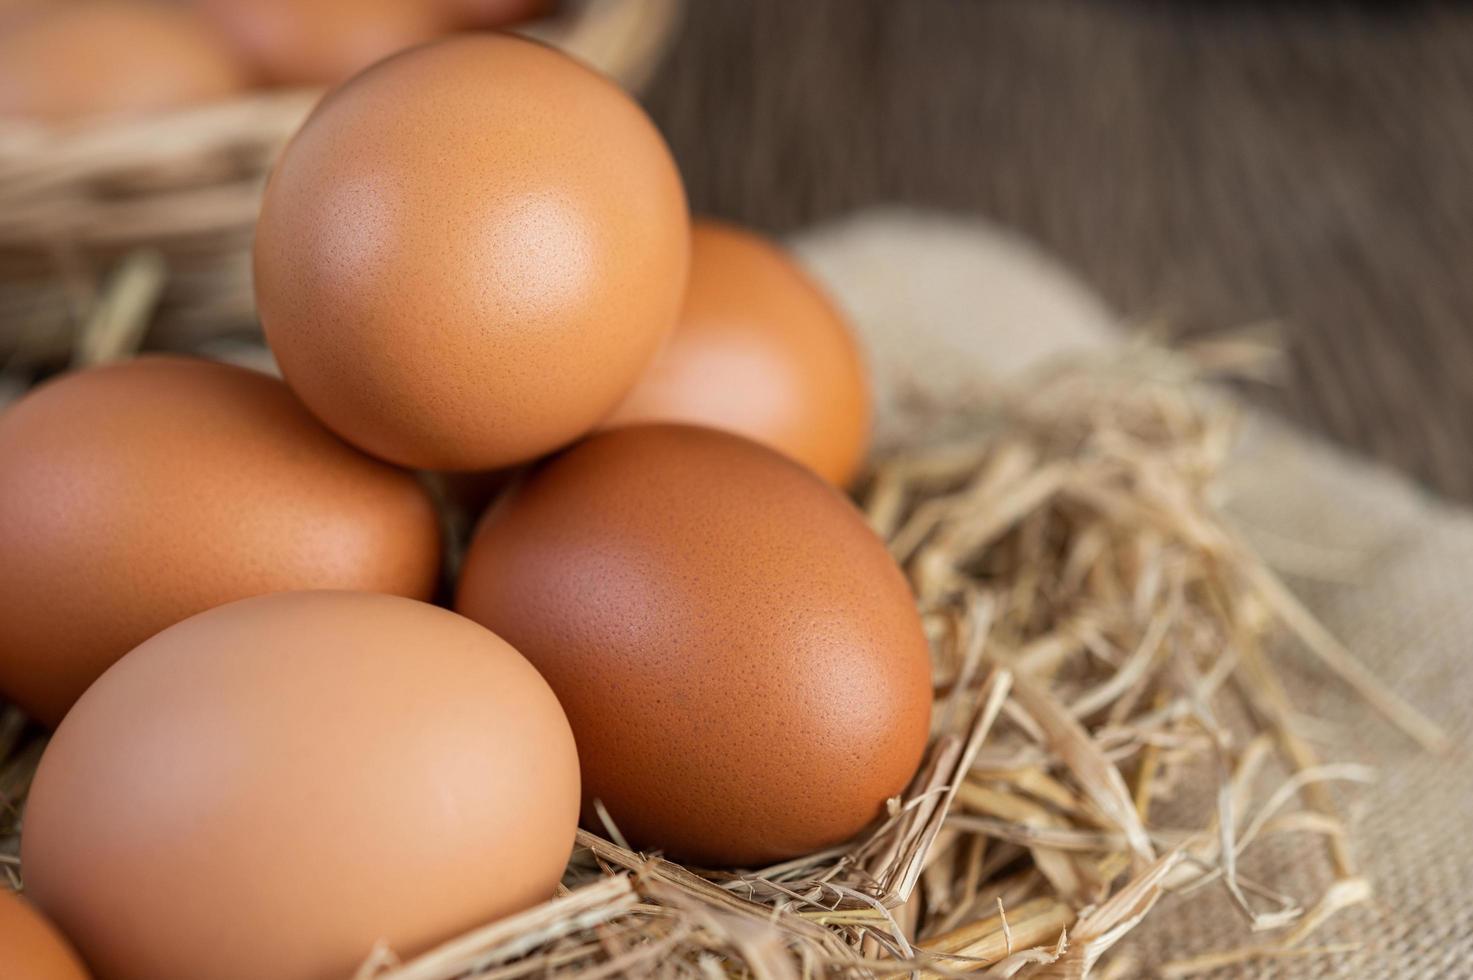 rauwe eieren op hennep en stro foto